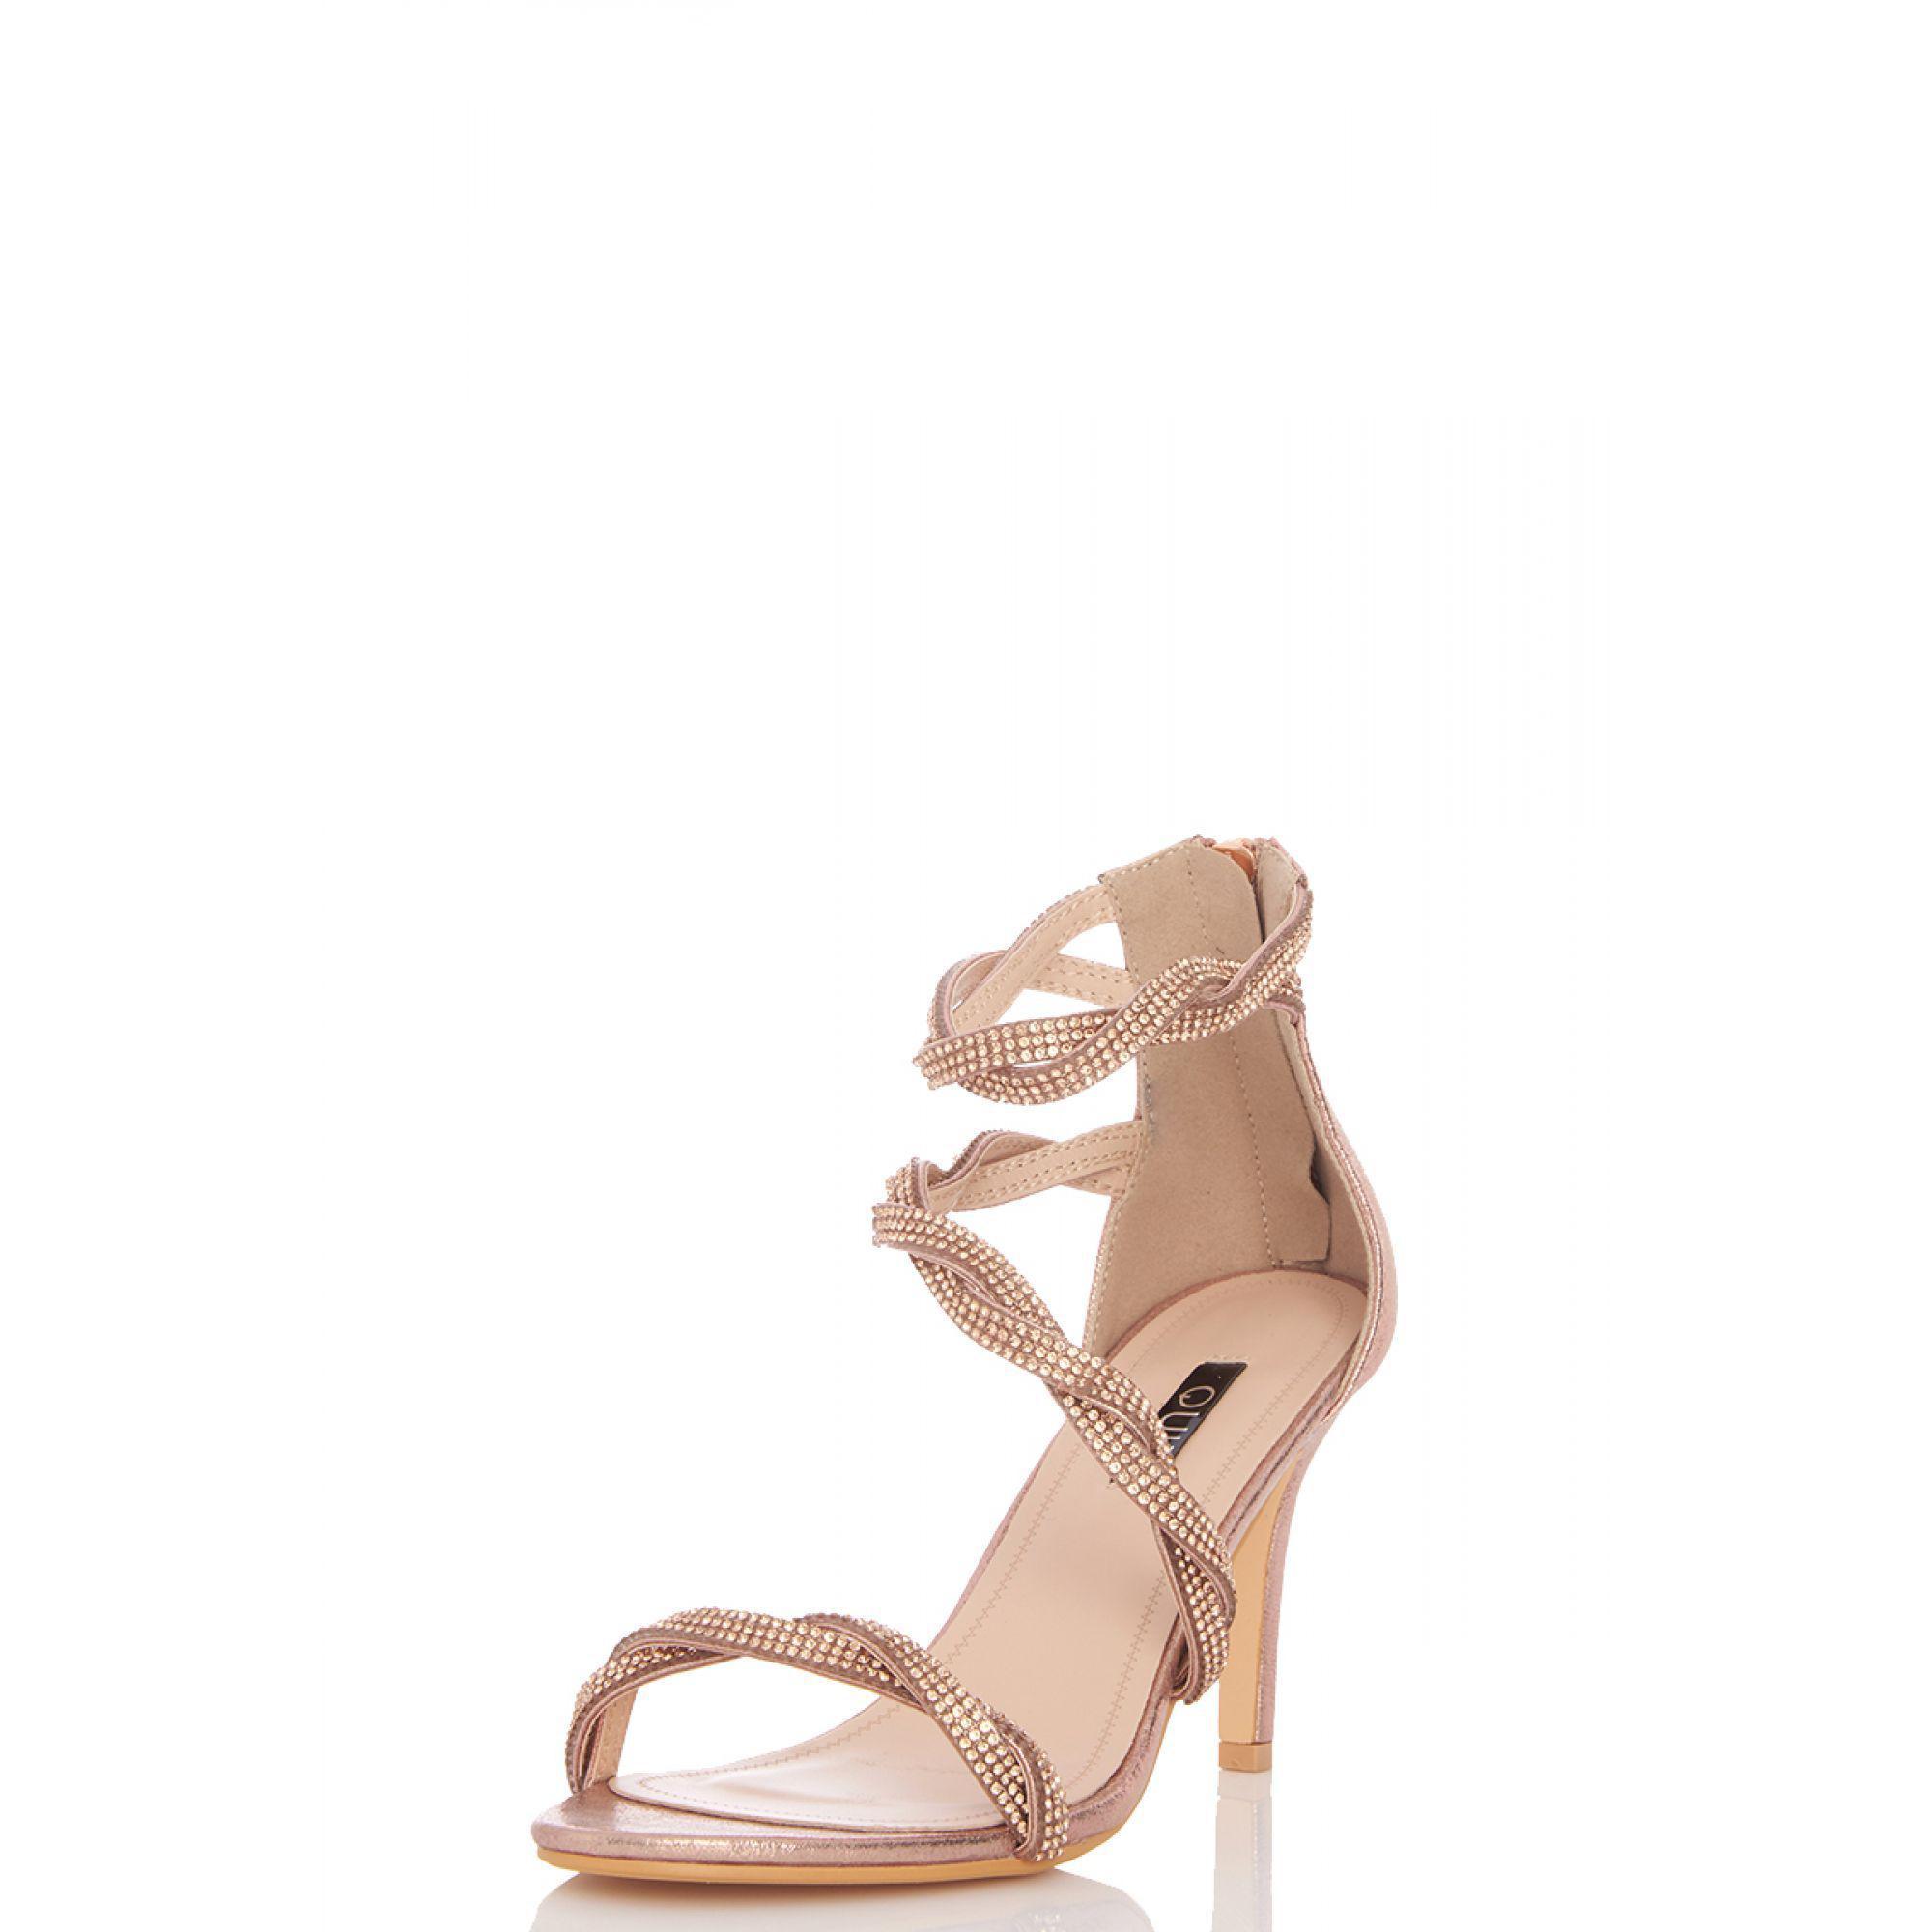 fa9888b0360a ... Rose Gold Diamante Twist Heel Sandals - Lyst. View fullscreen